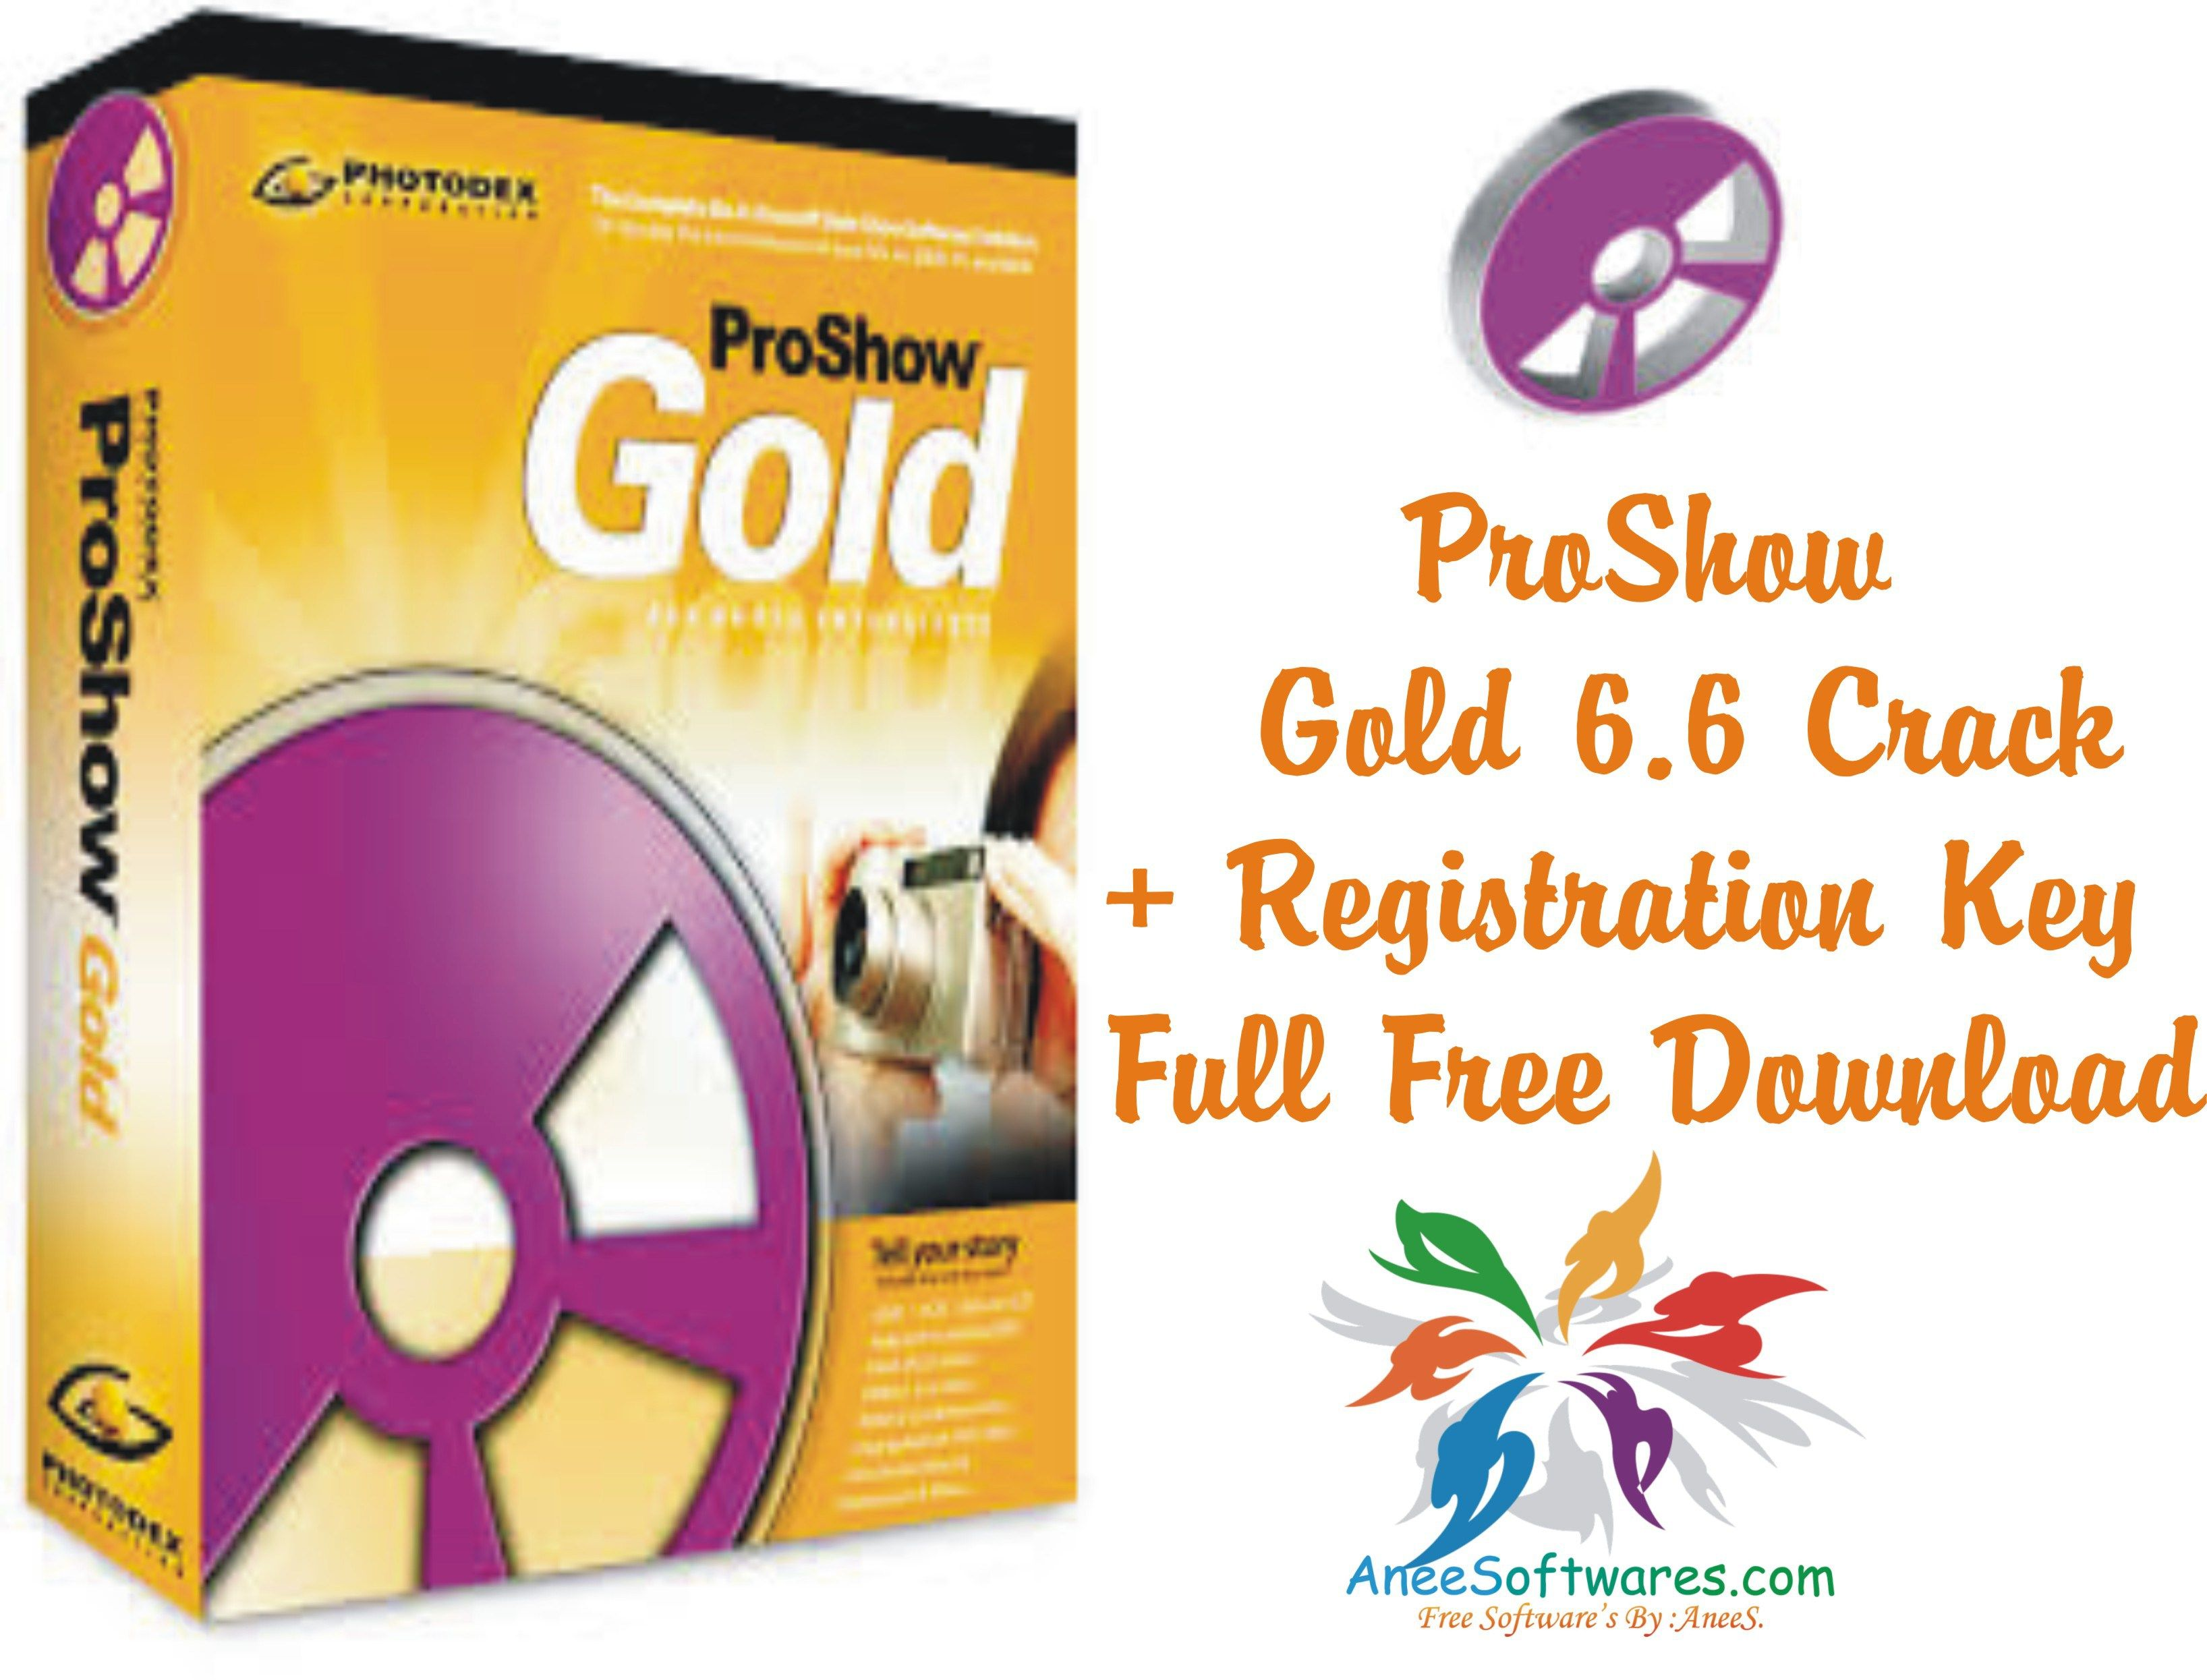 Proshow gold 4. 0 2542 crack.